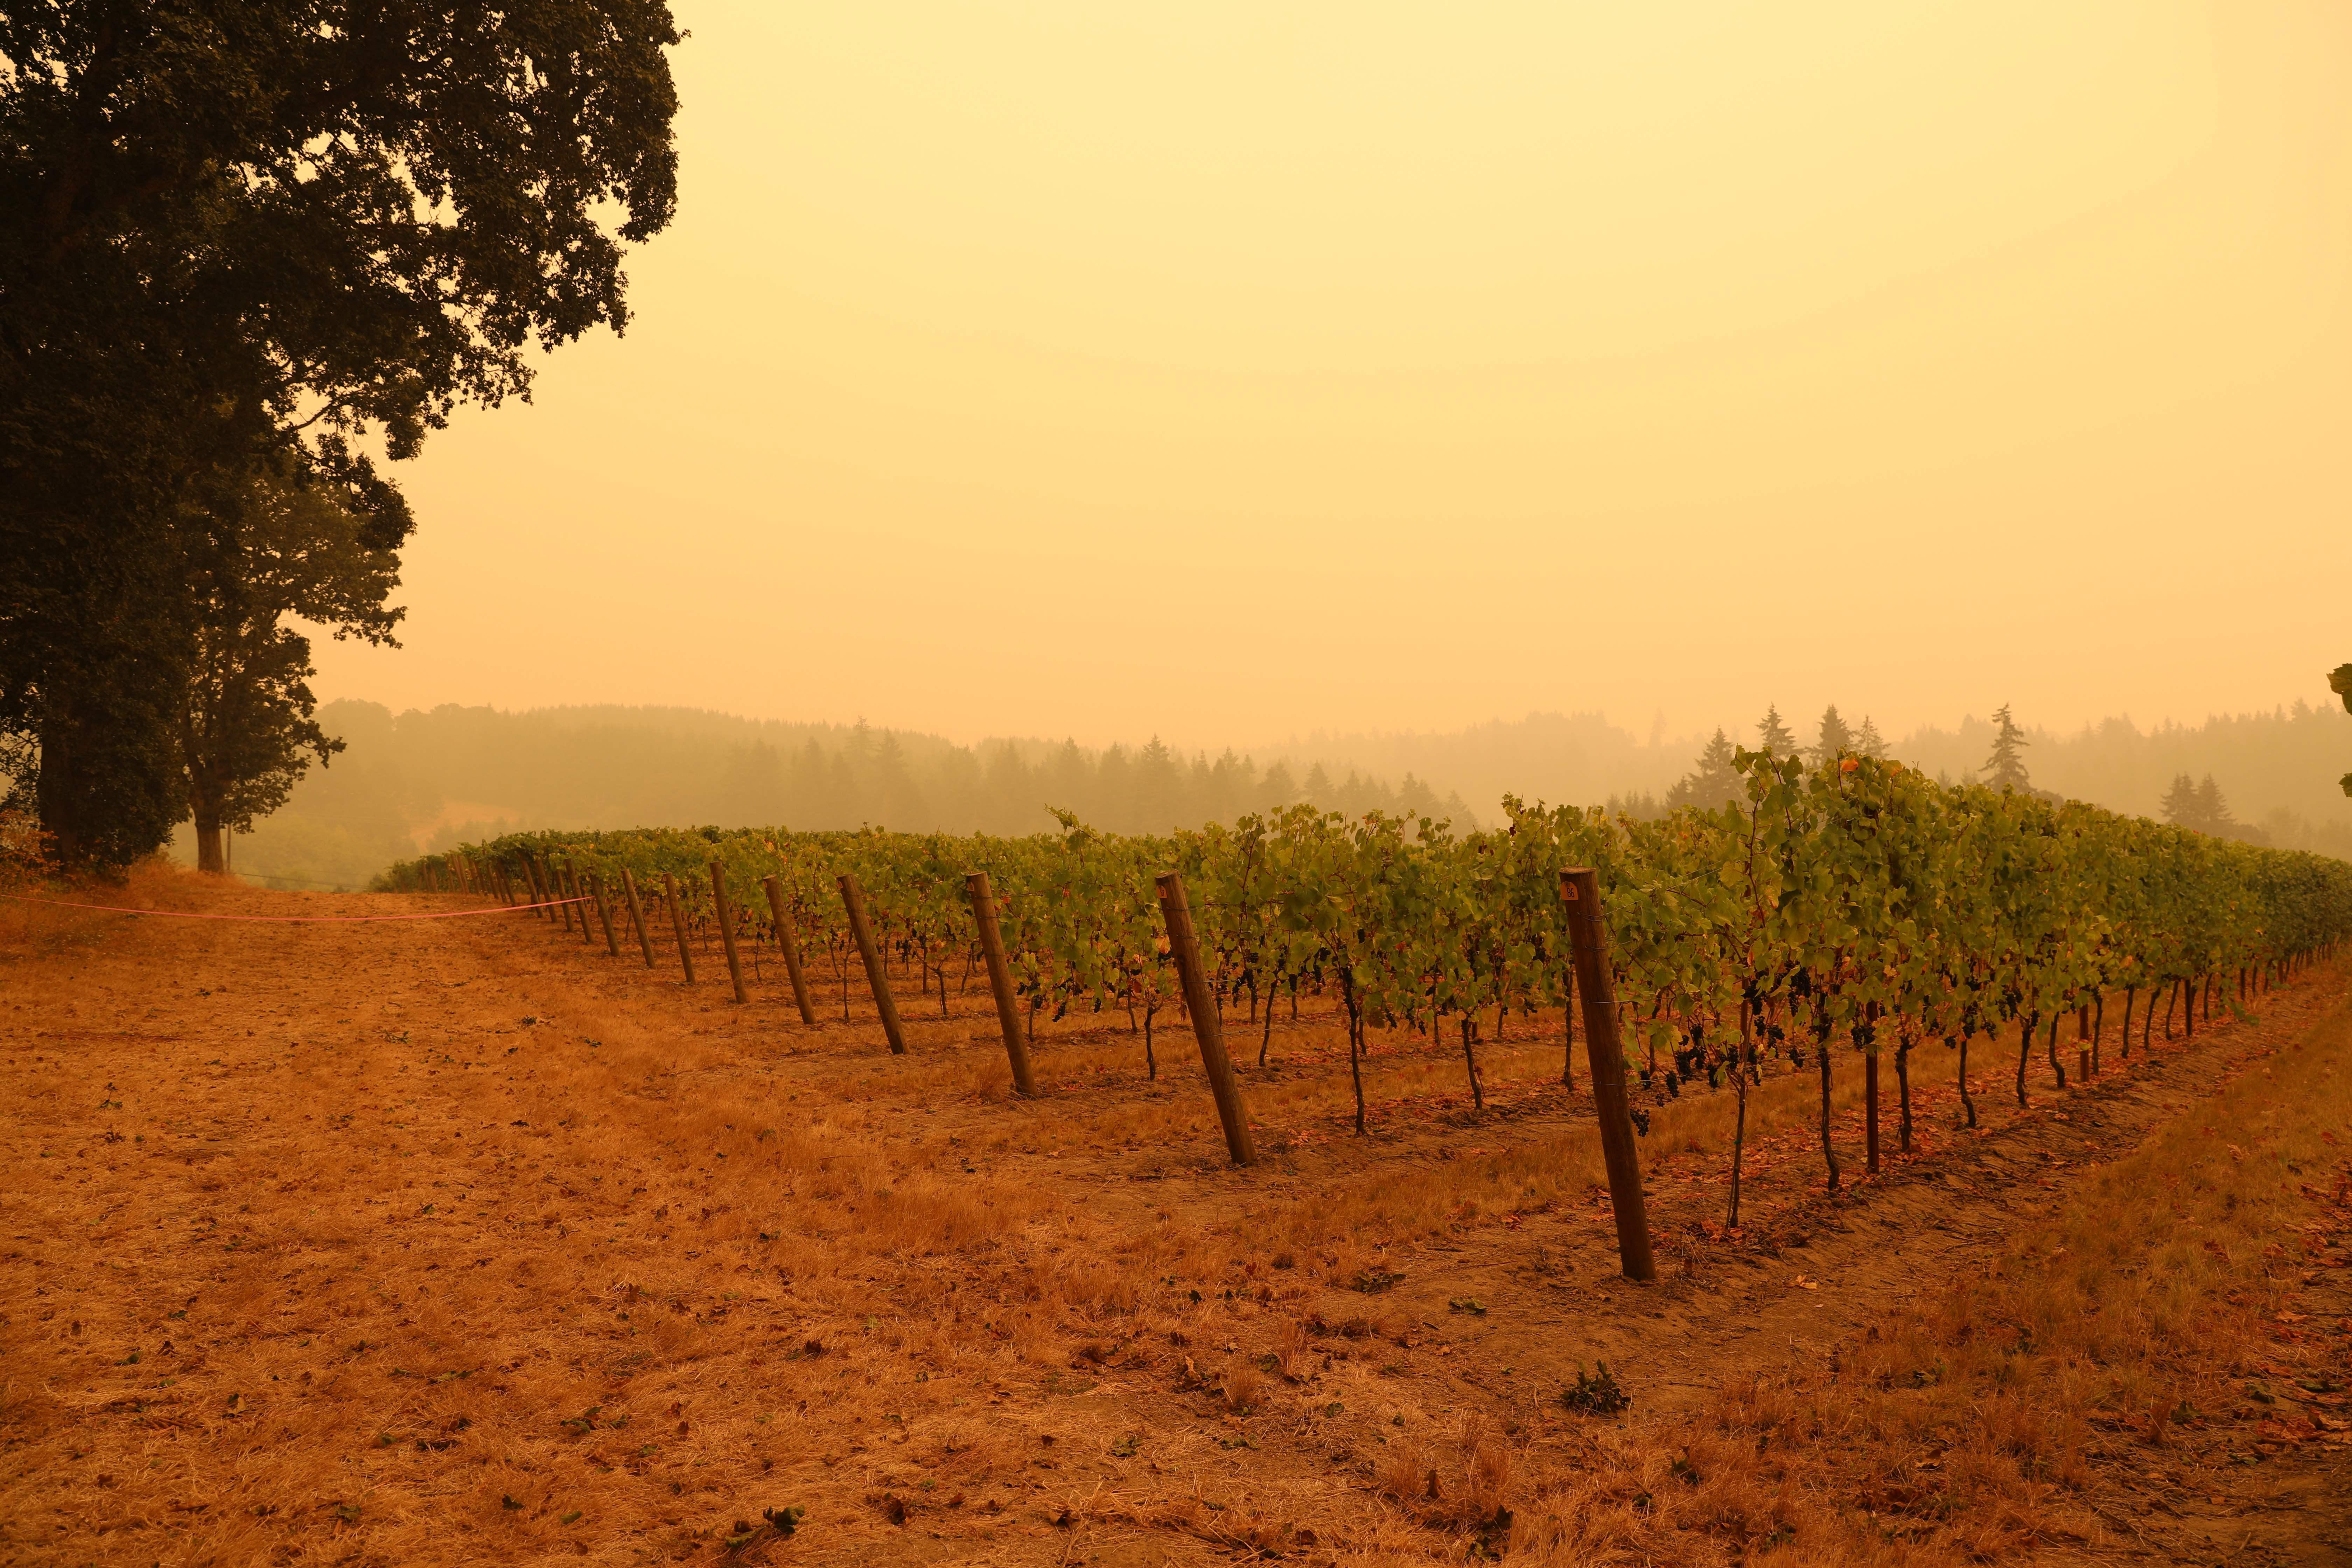 Hazy skies hang over a vineyard in wine country